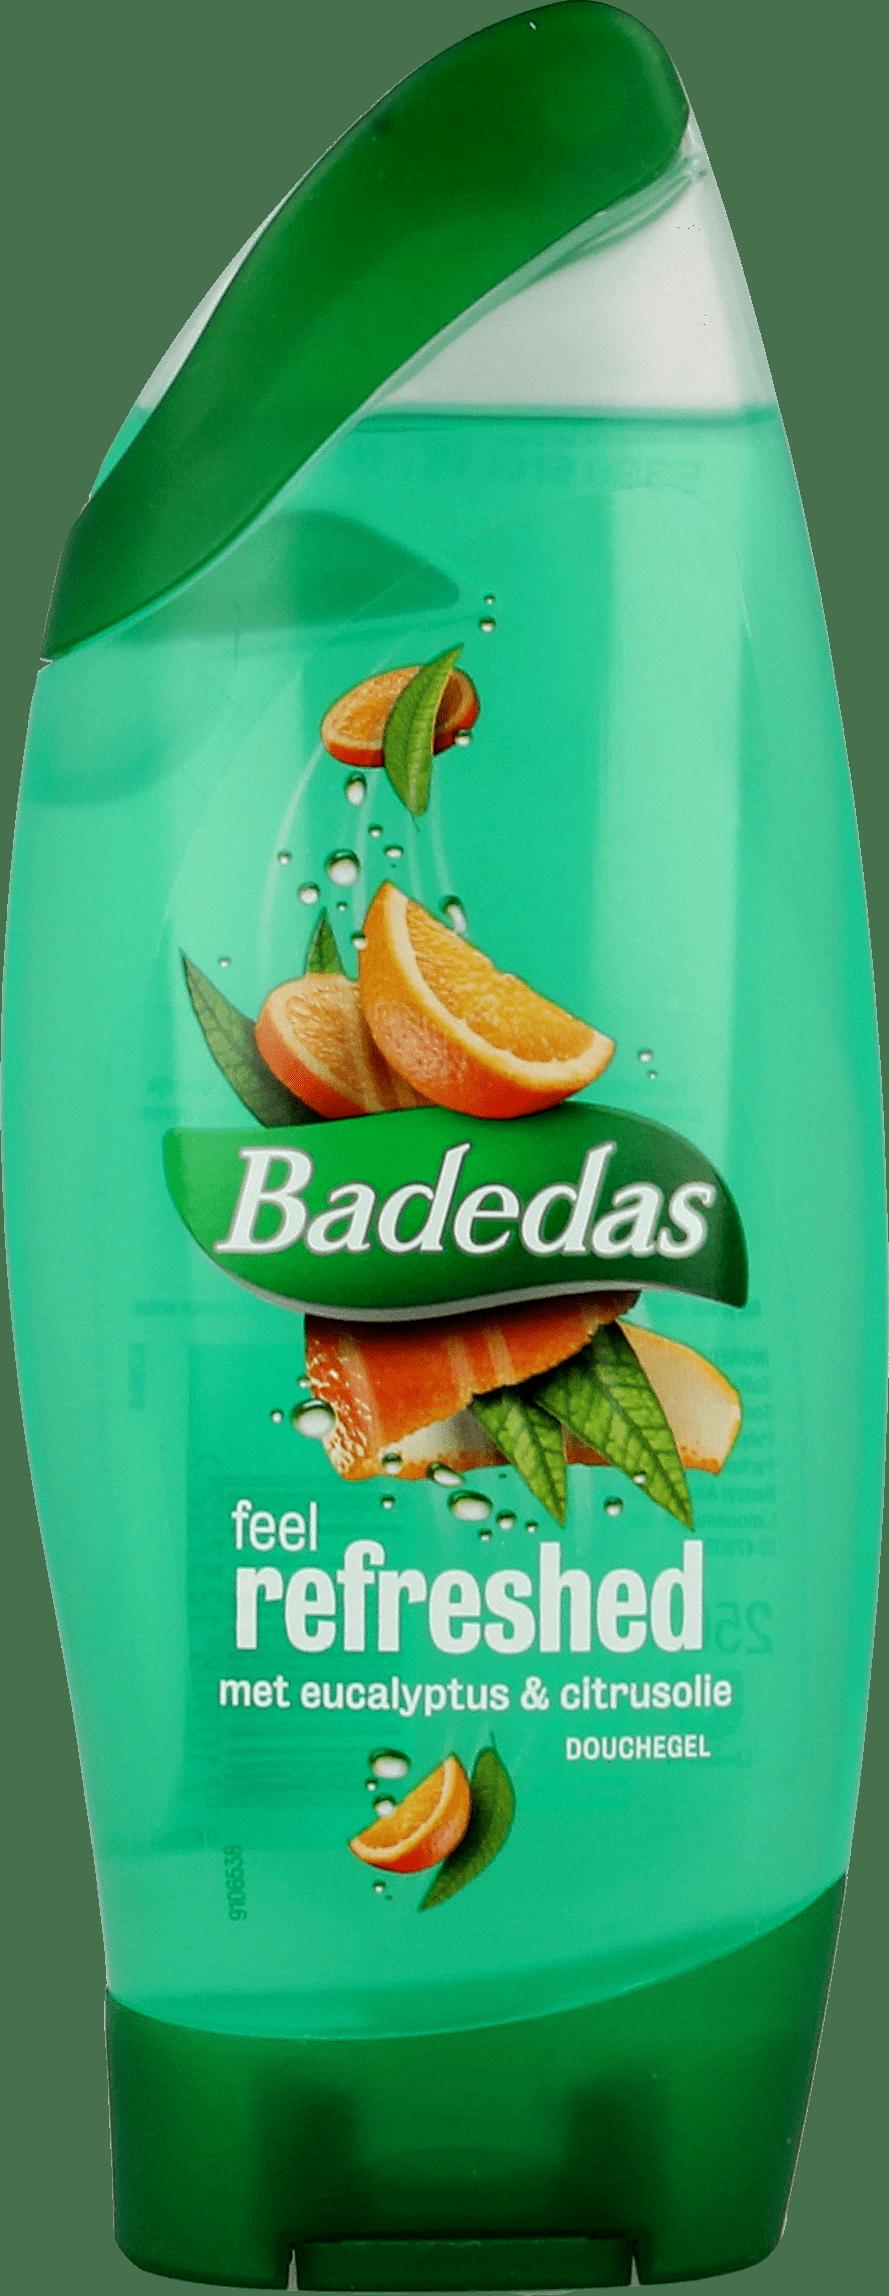 Badedas Douchegel  Feel Refreshed